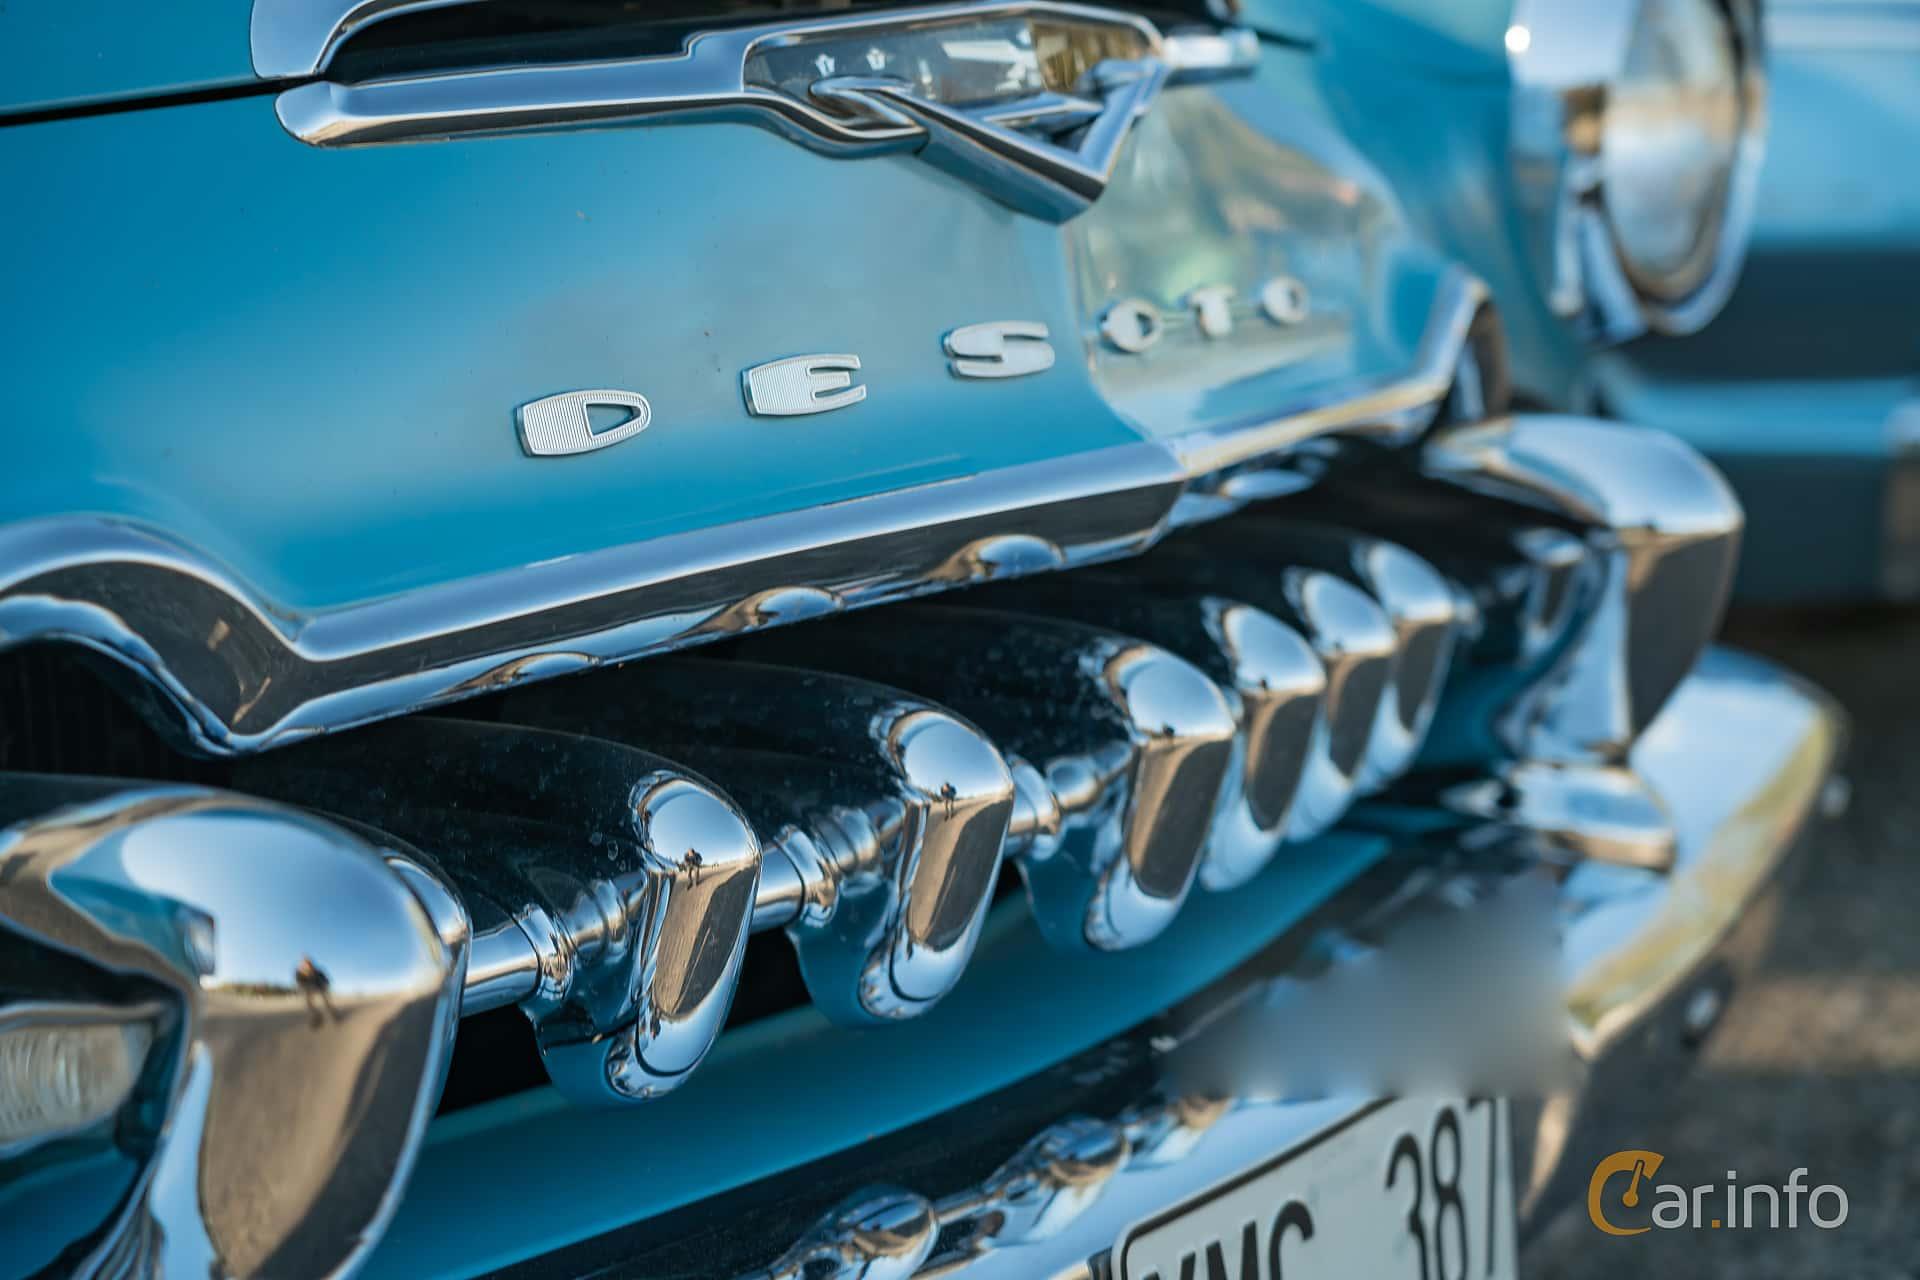 DeSoto Firedome Sedan 4.5 V8 Automatic, 188hp, 1955 at Lissma Classic Car 2019 vecka 20